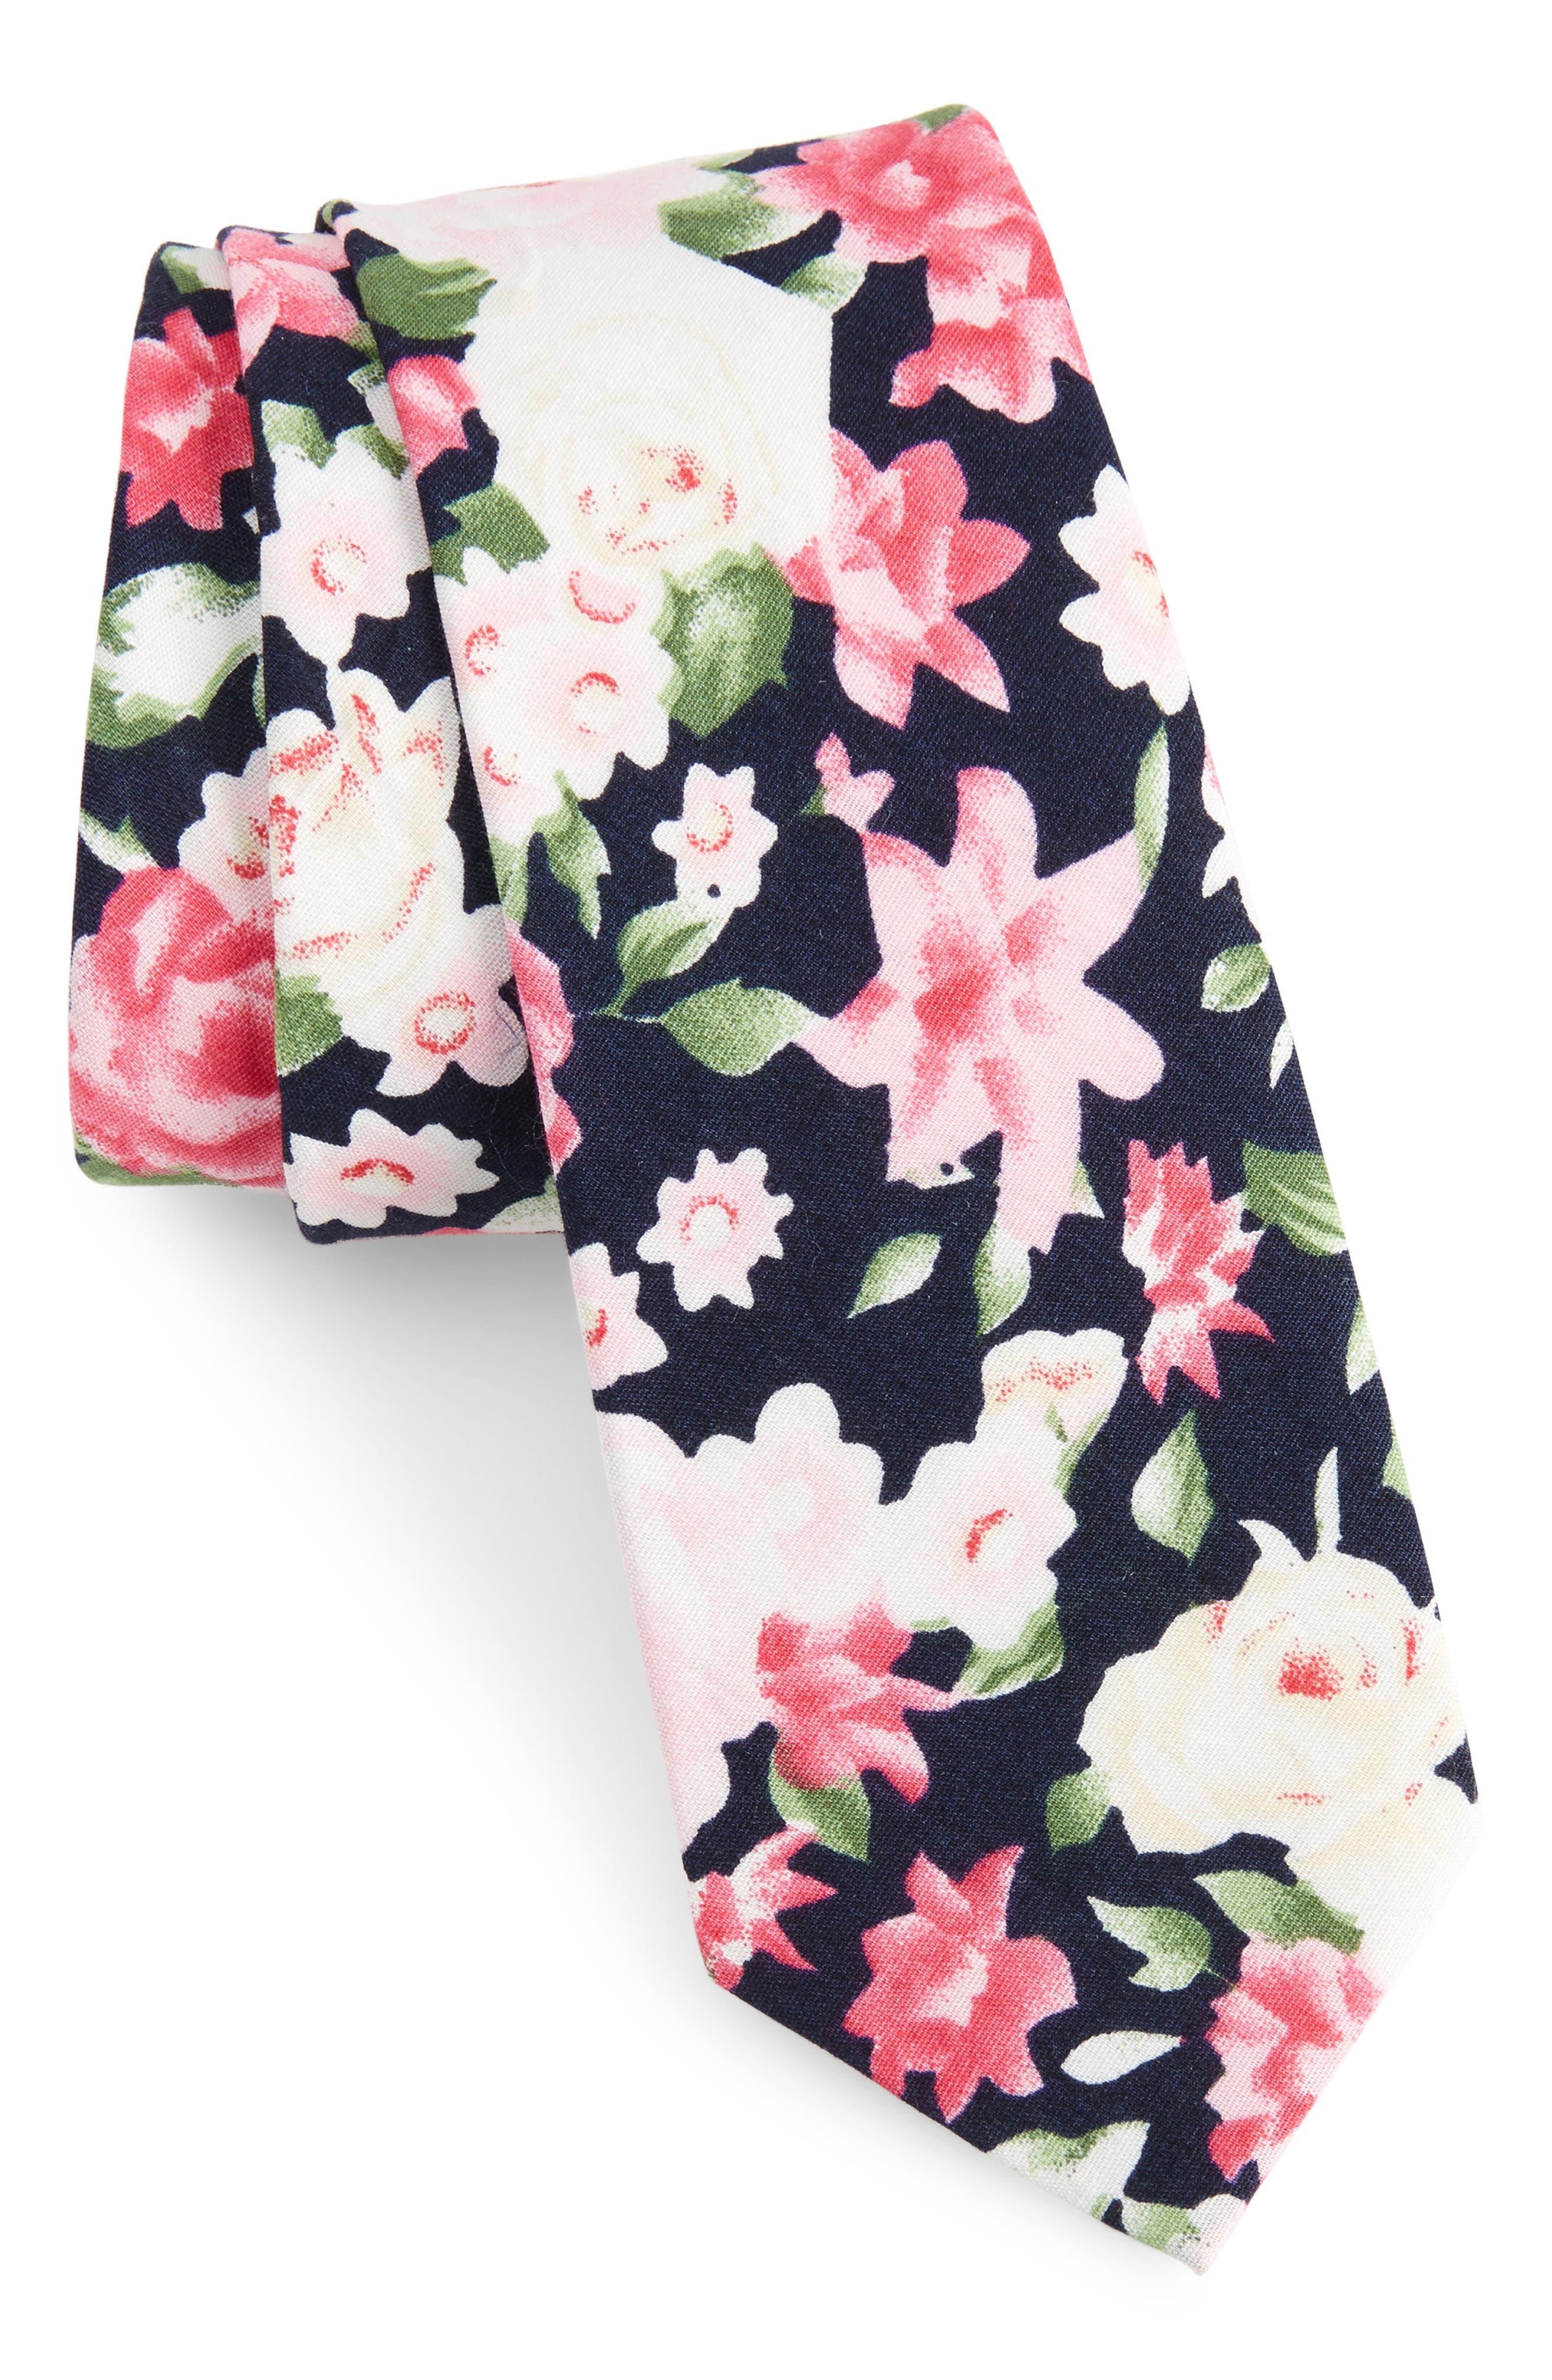 Alternate Image 1 Selected - 1901 Colbert Floral Cotton Skinny Tie